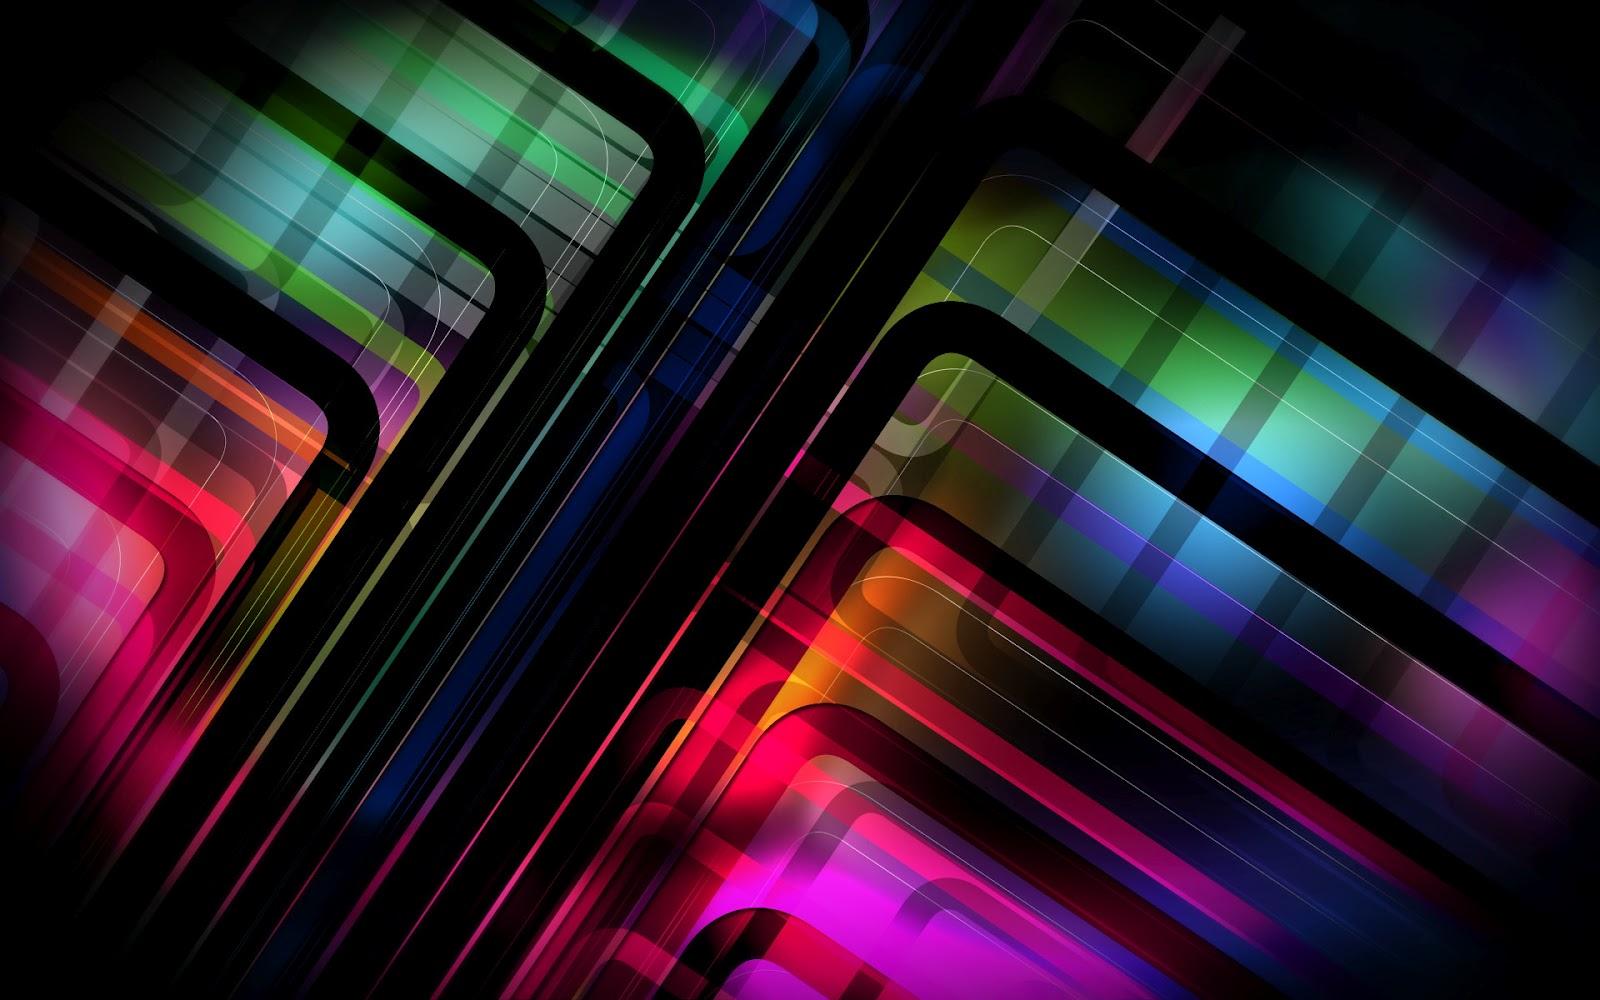 Abstract color Wallpaper HD Wallpaper 1600x1000